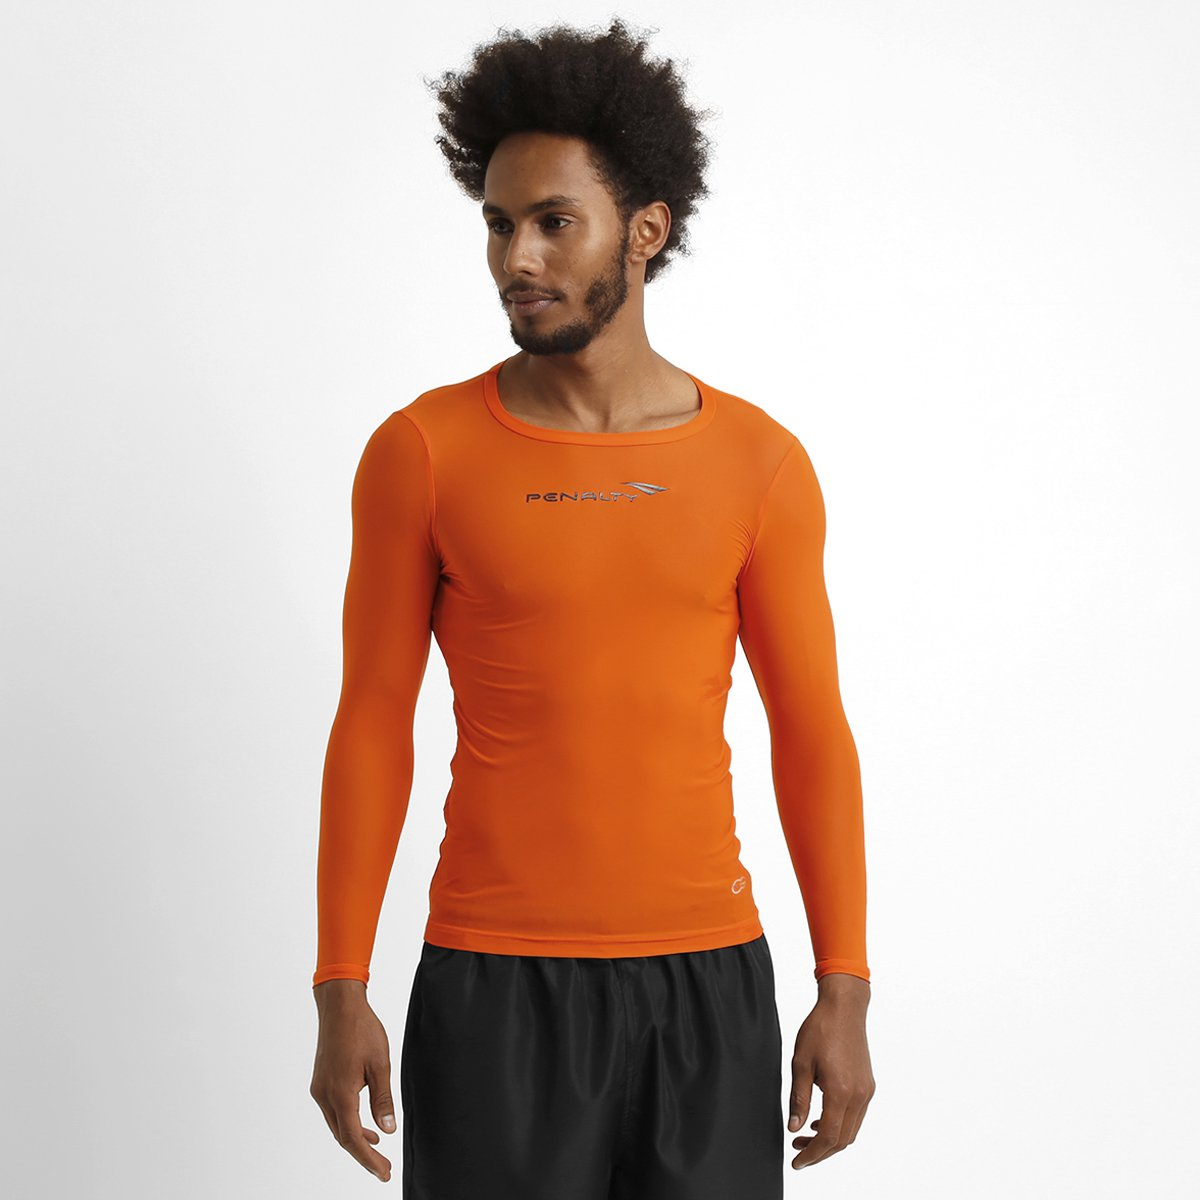 b8be42c690605 Camisa Térmica Penalty Matis 1 M L - Compre Agora